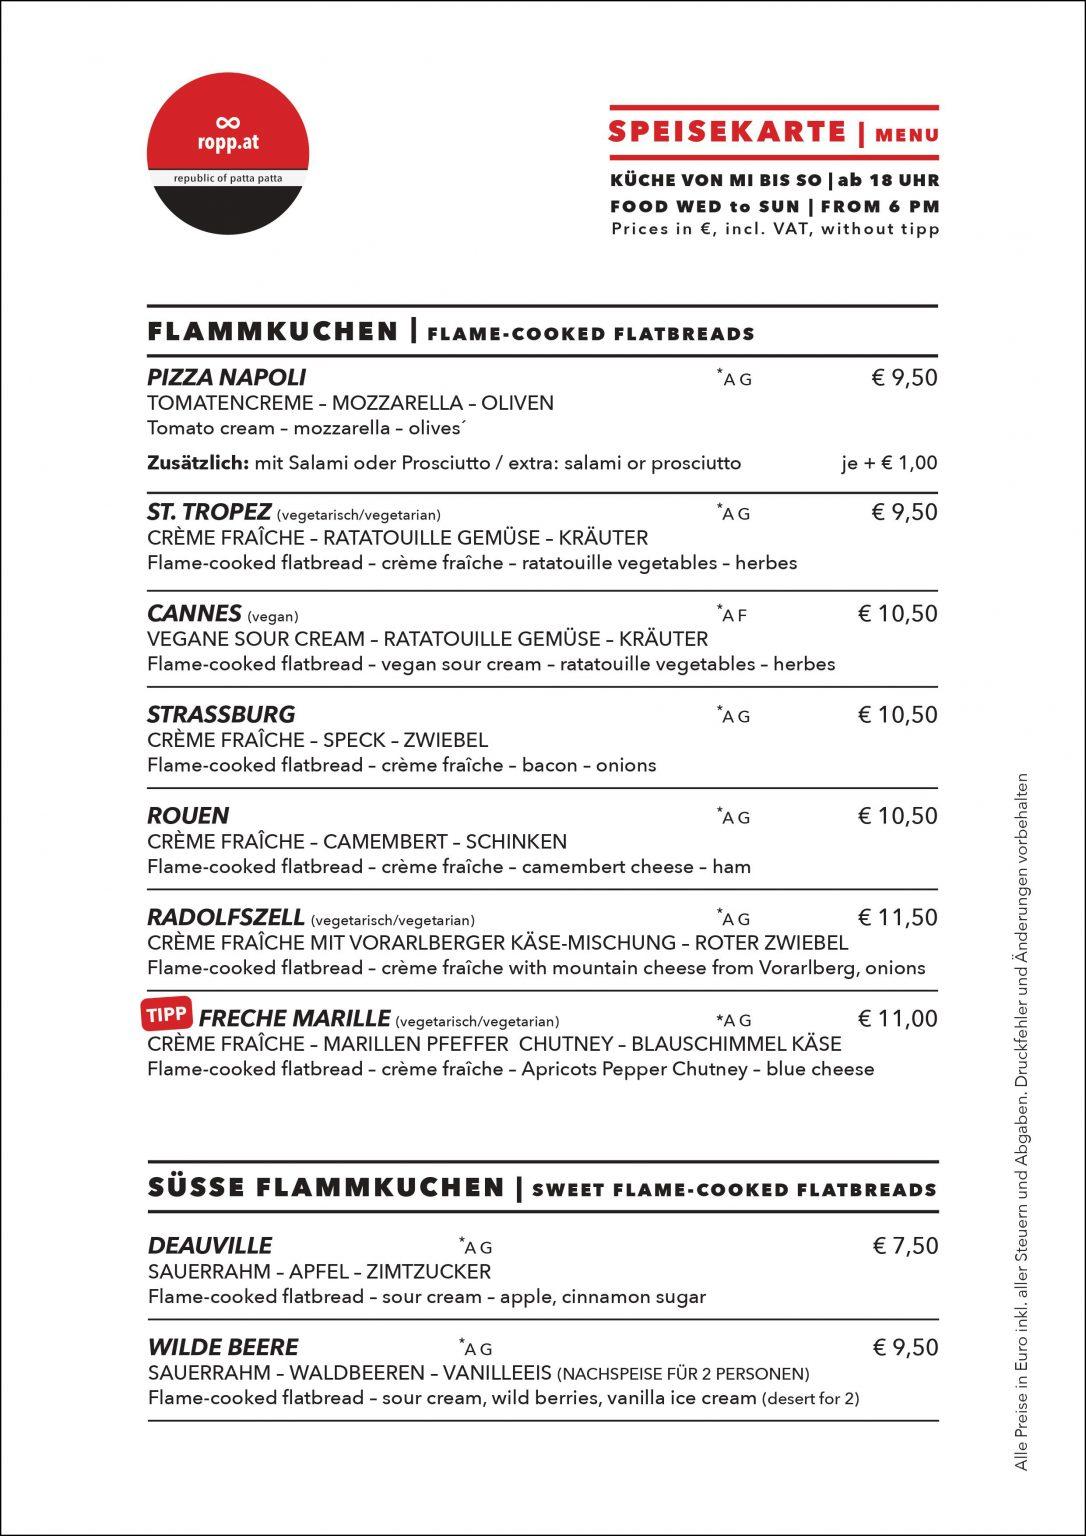 Speisekarte: Flammkuchen | Flame-cooked flatbread